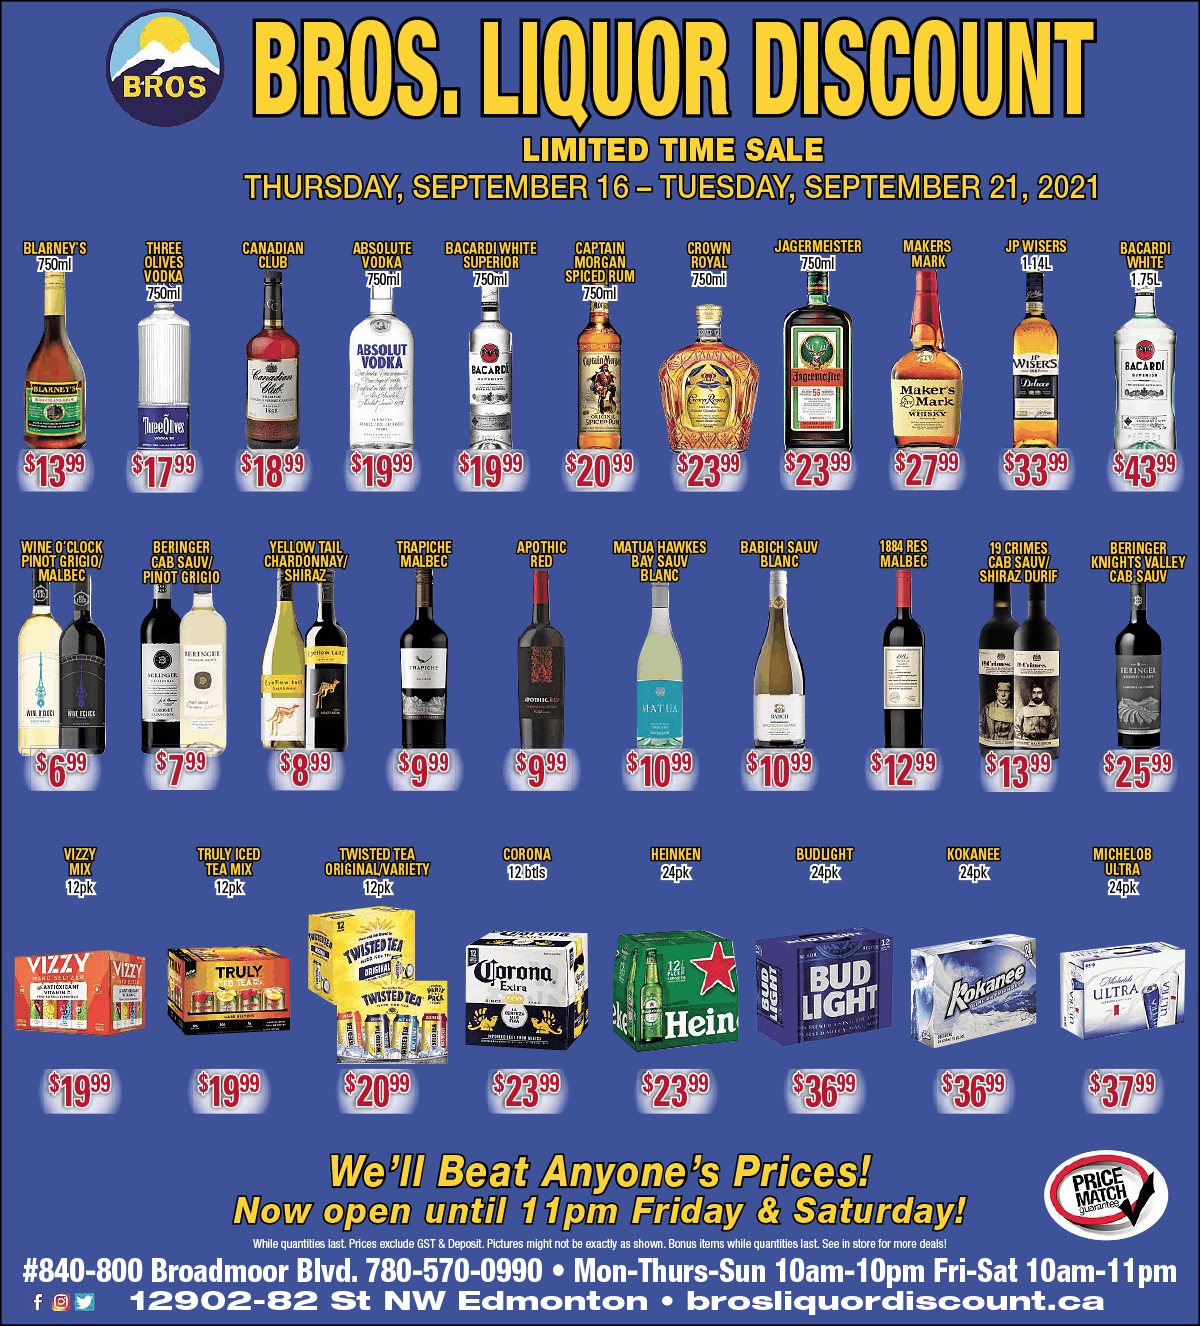 Discount Liquor Flyer August 2021, Sherwood Park, AB